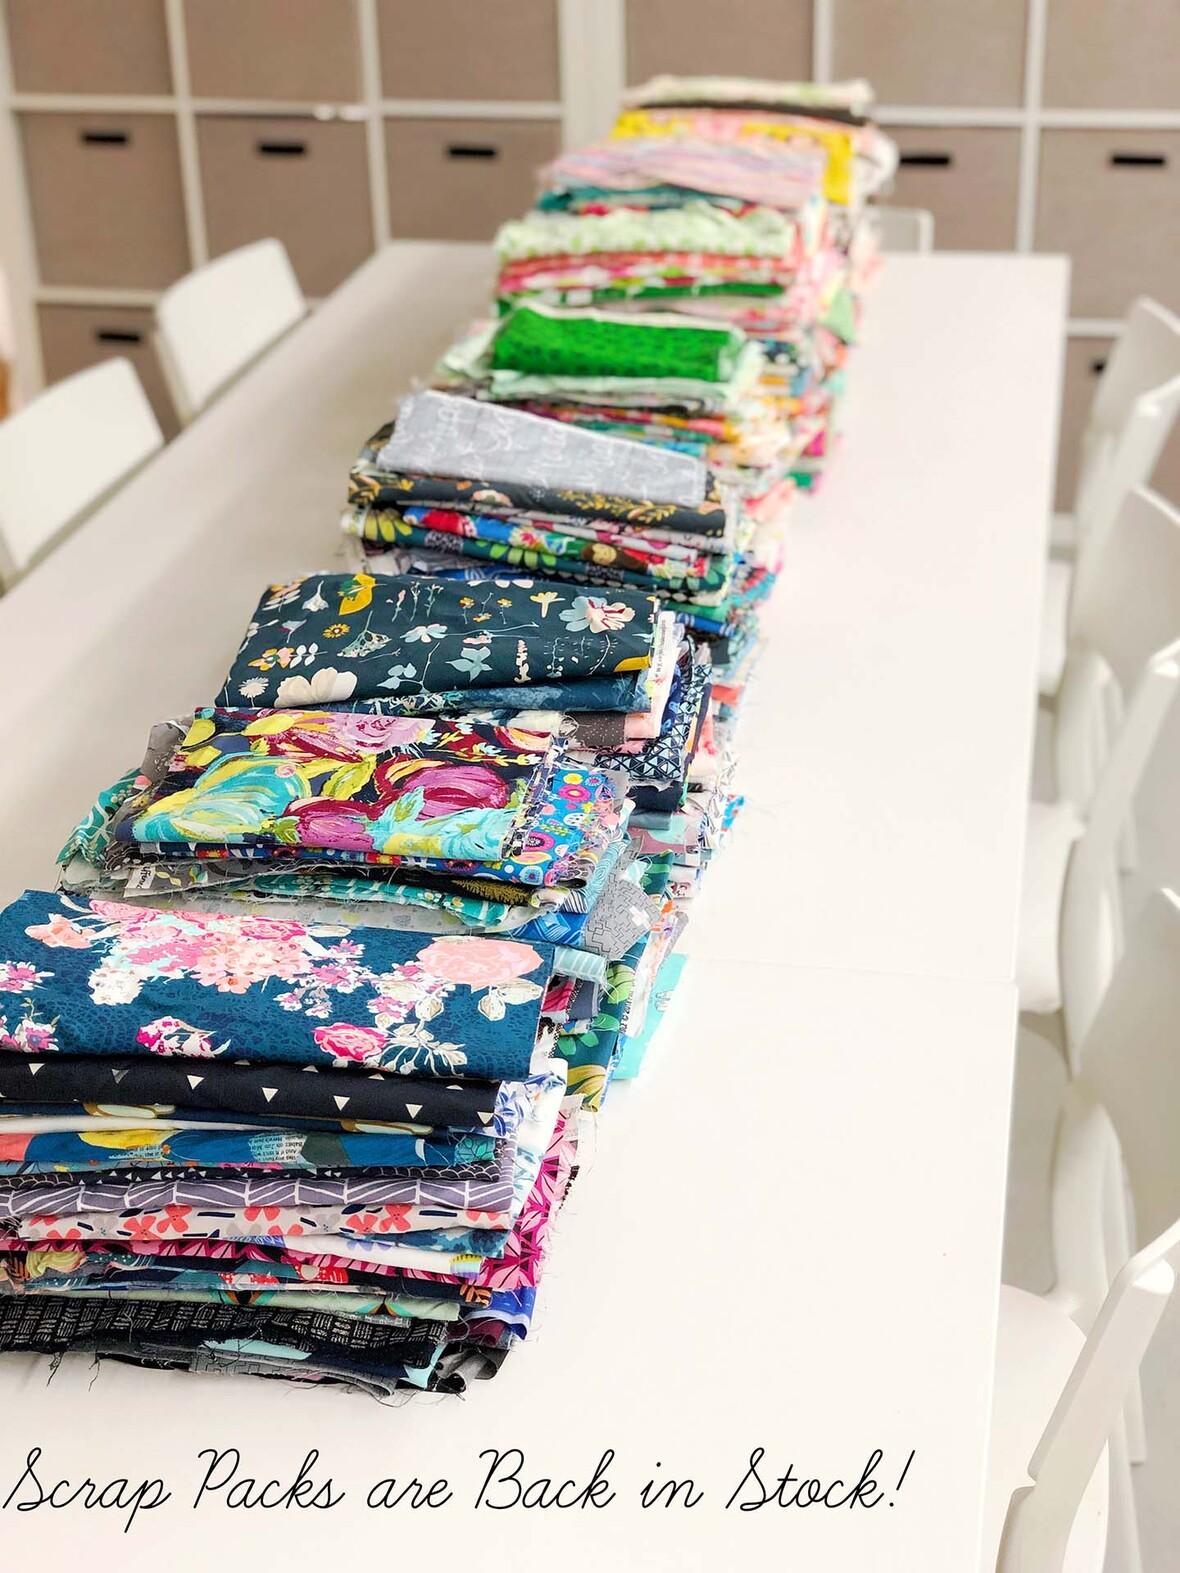 Hawthorne Fabric Scrap Packs